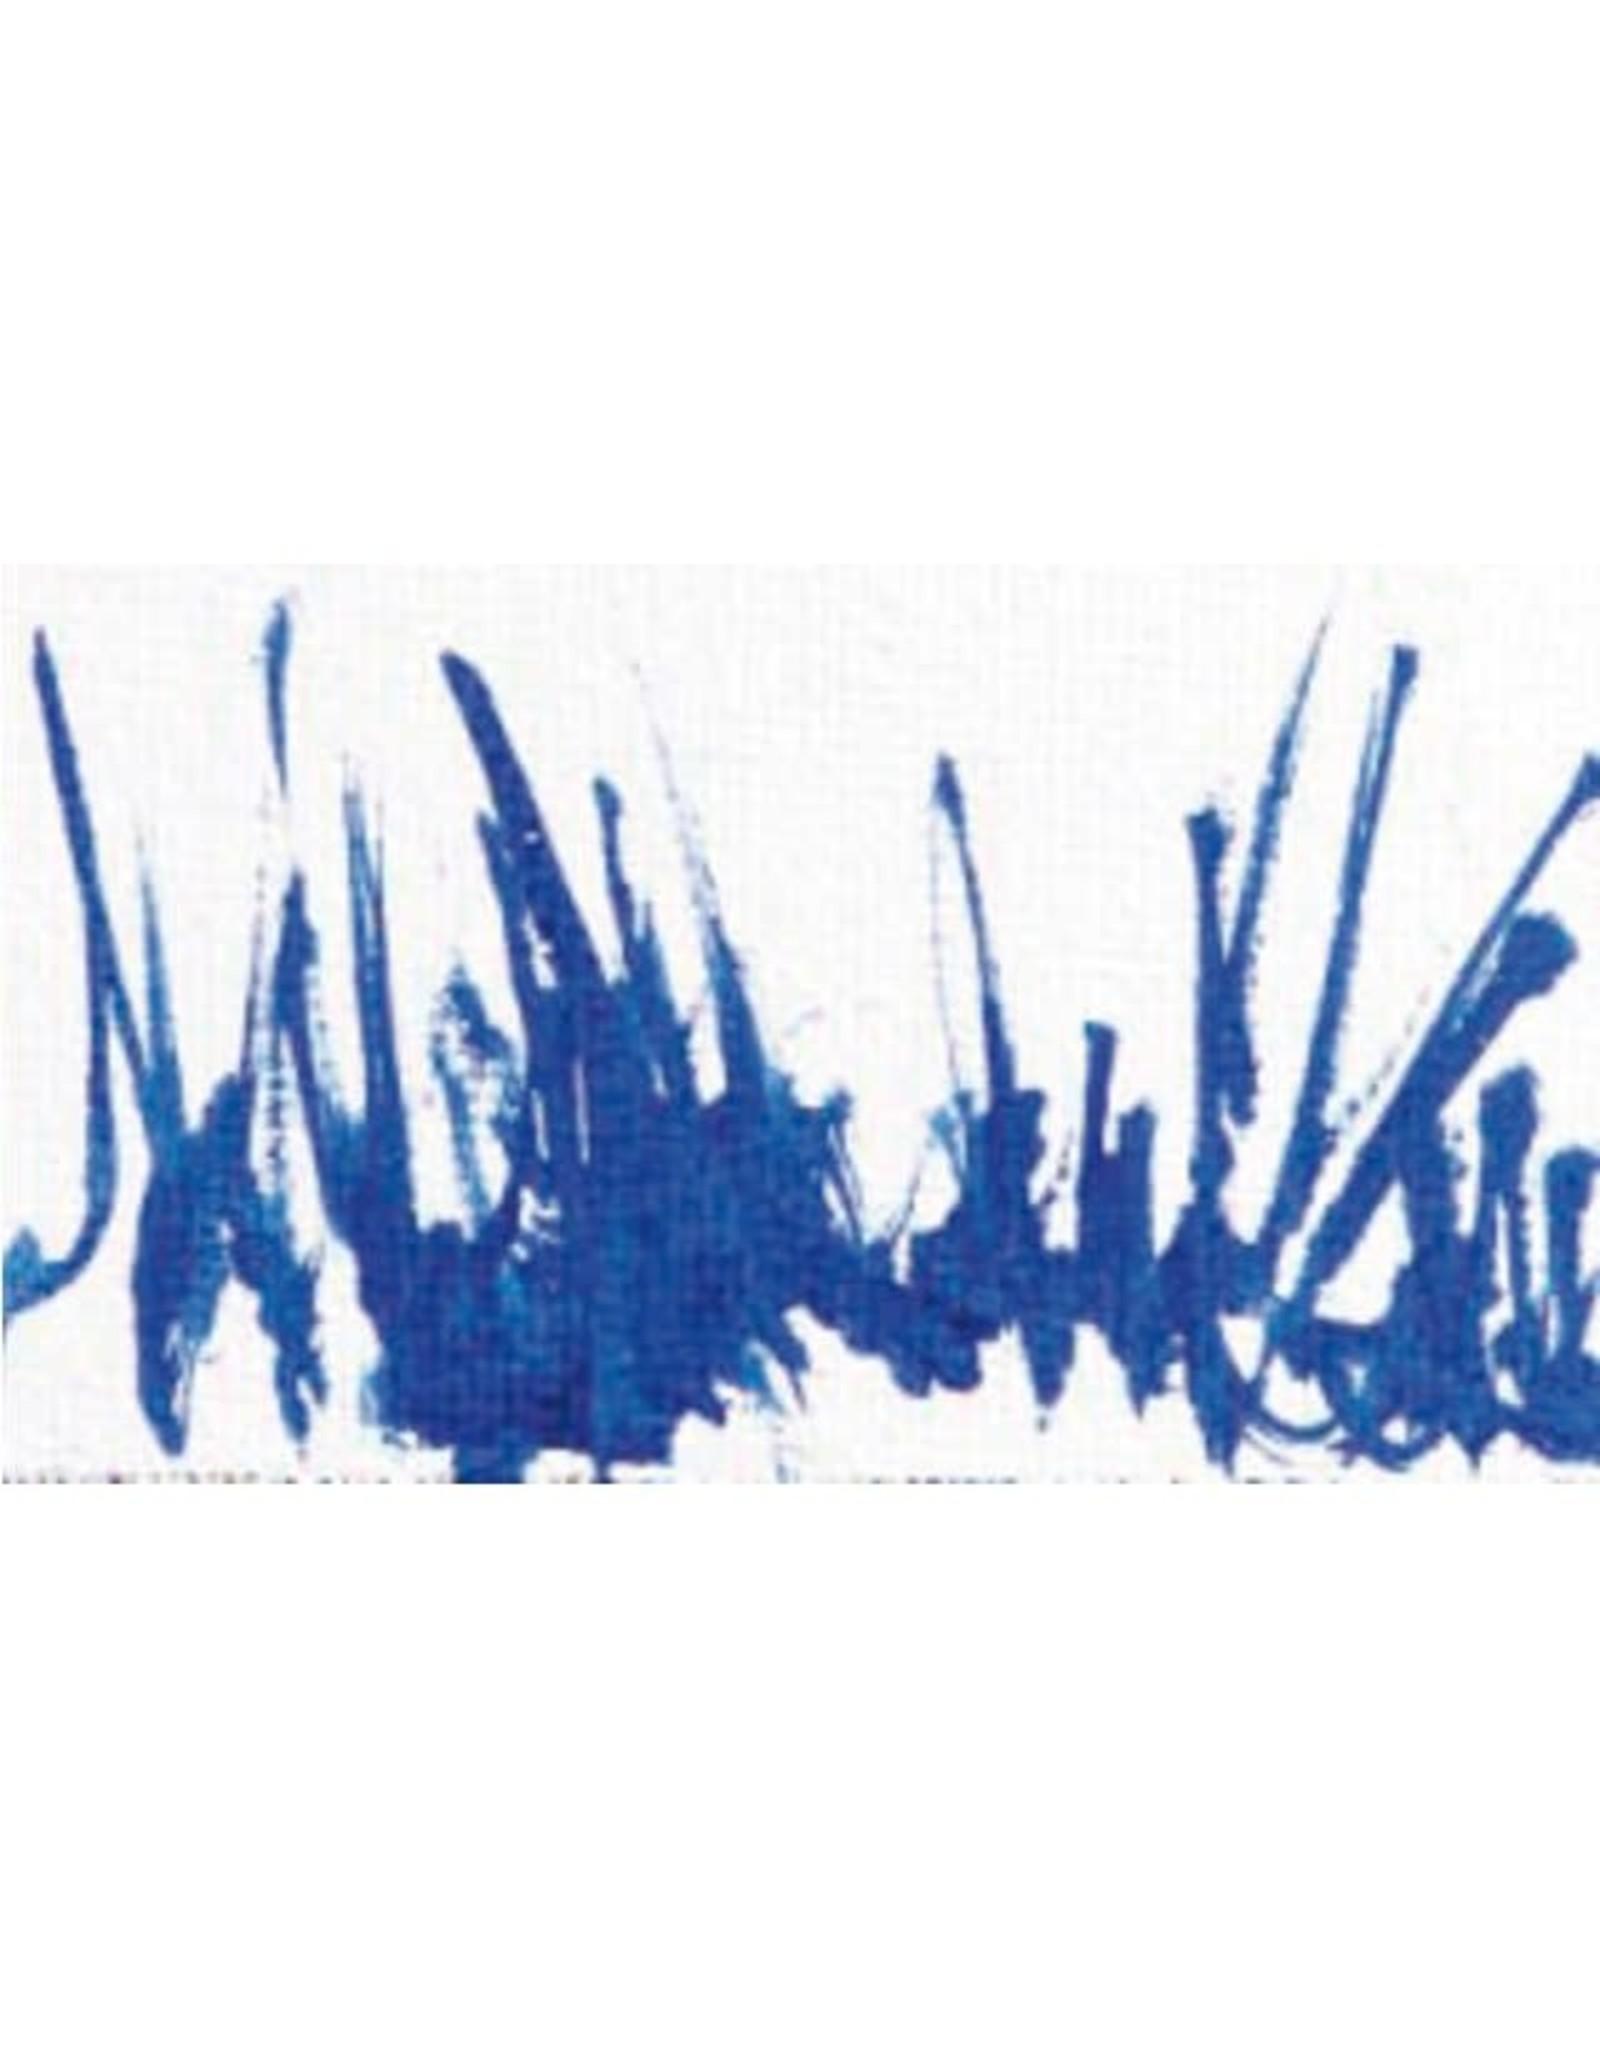 Rembrandt Olie/Acryl Penseel serie 310 nr 0